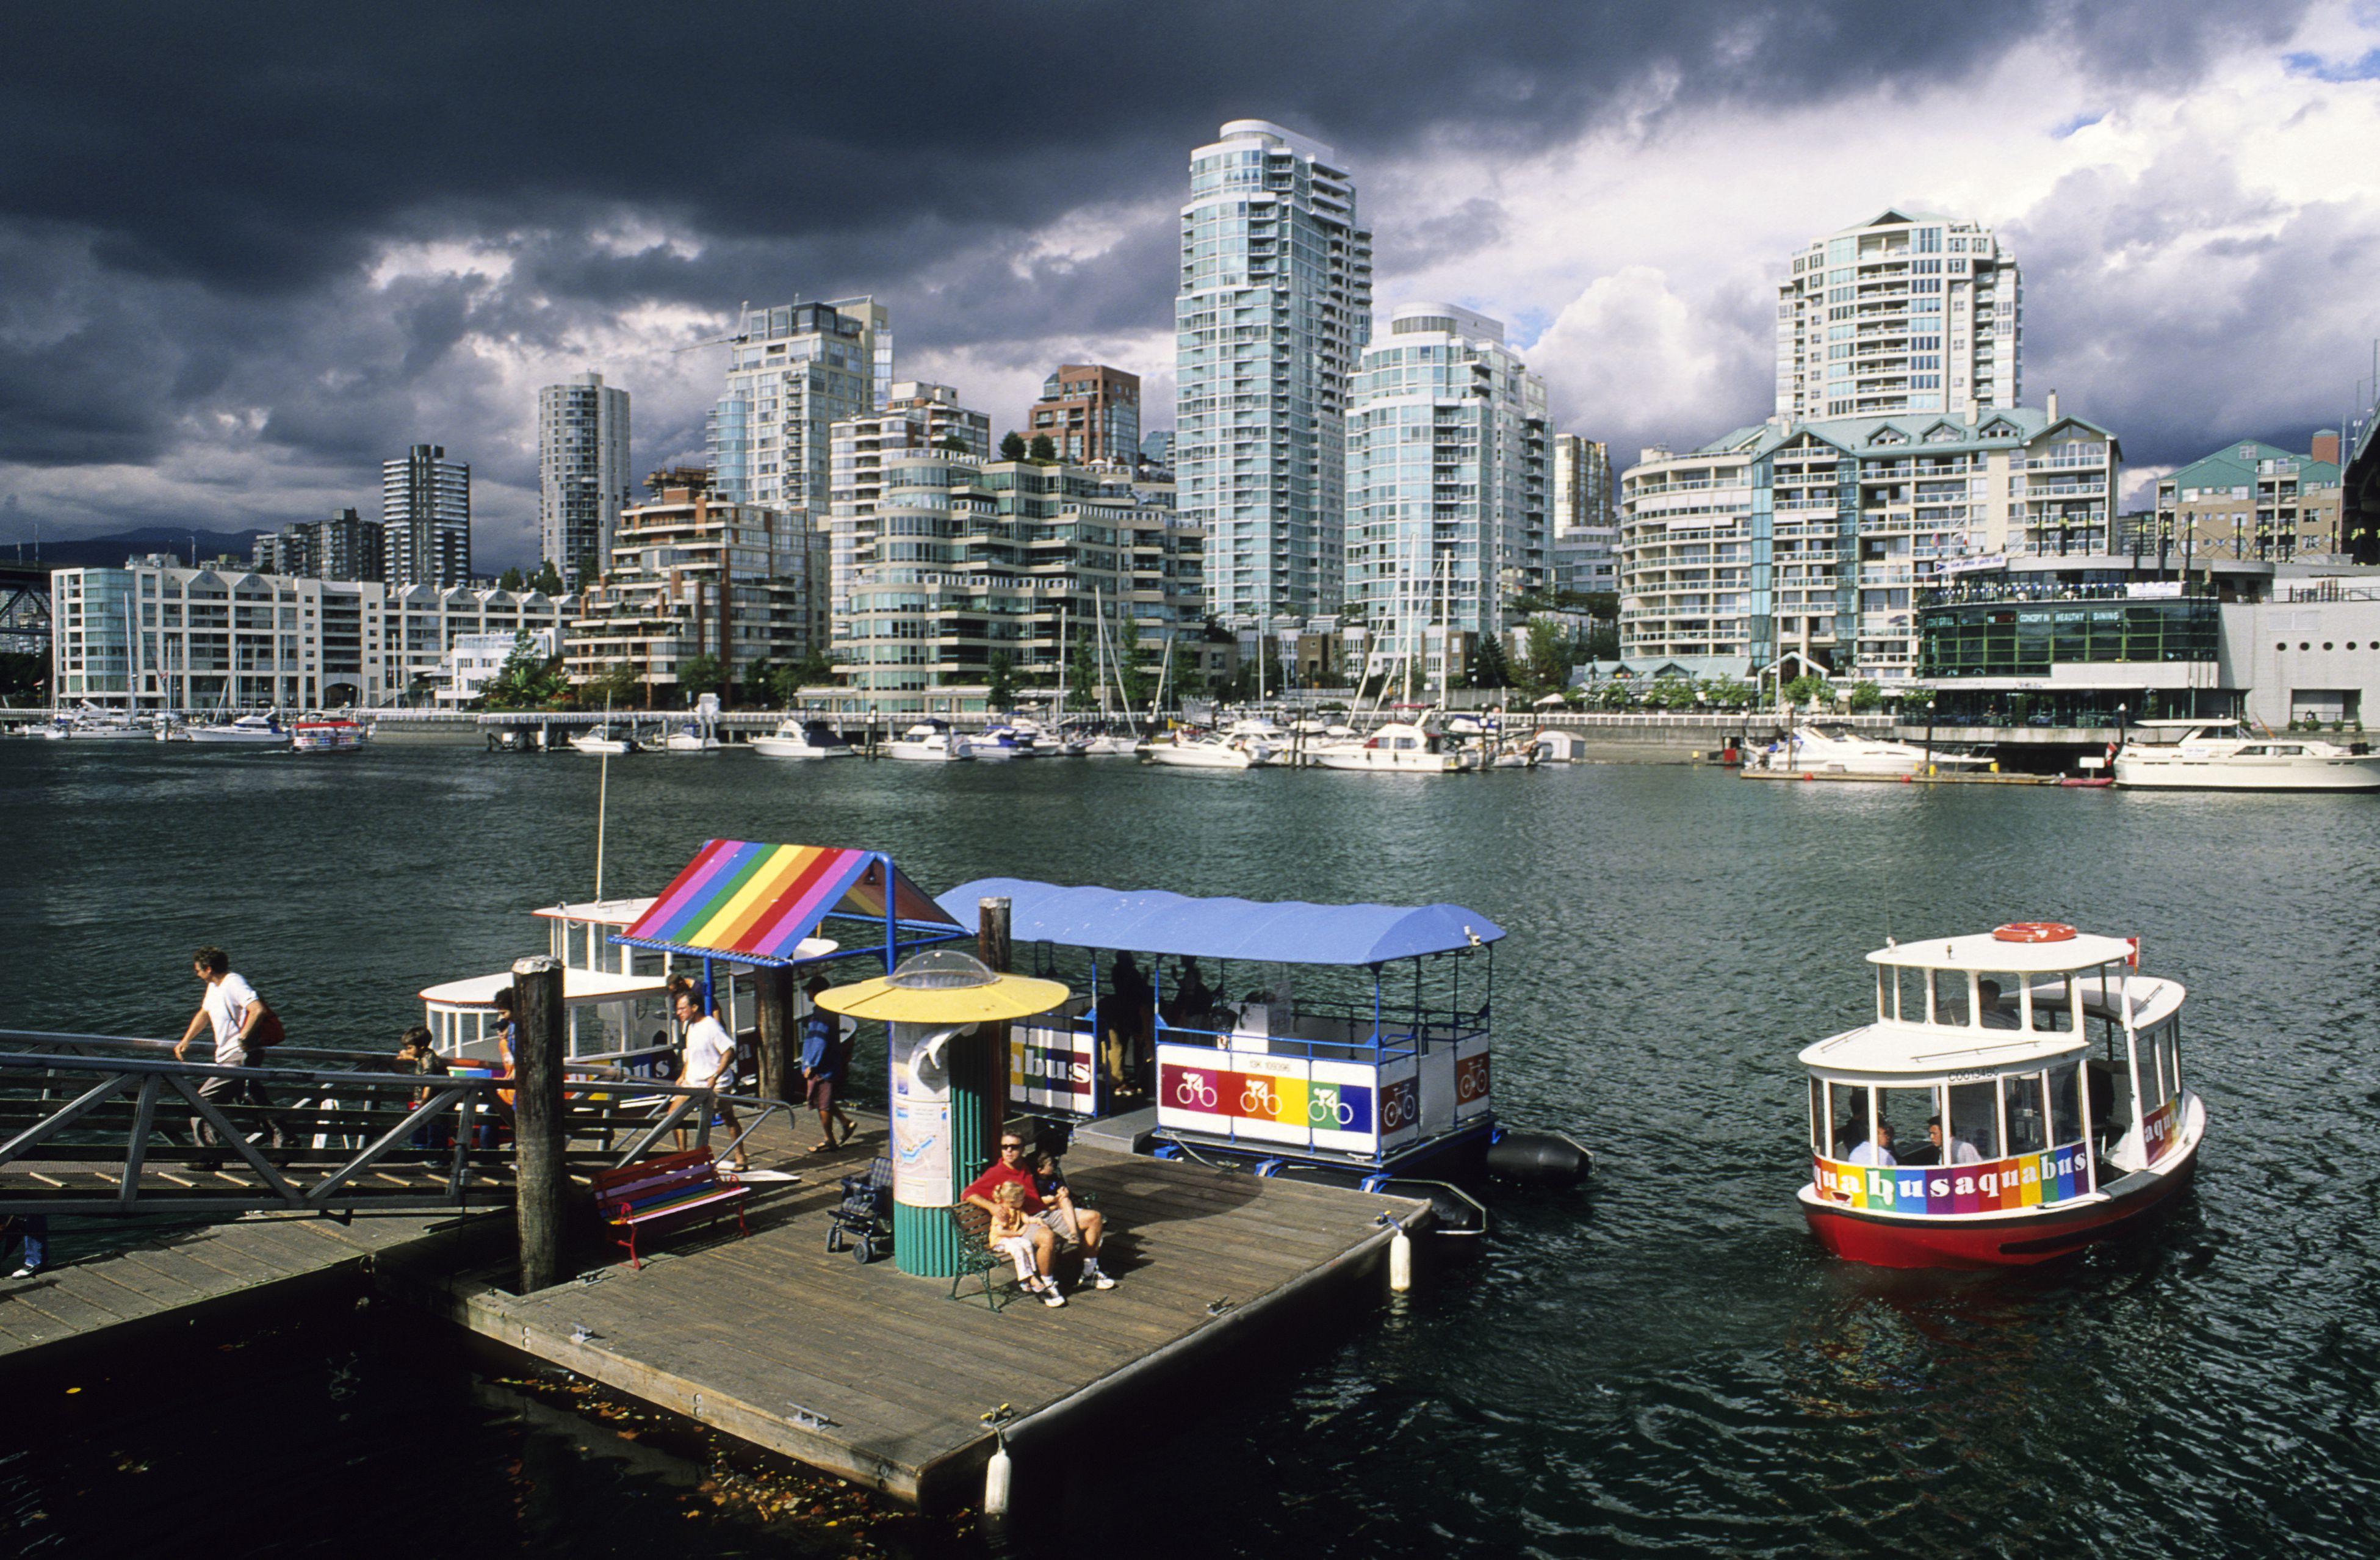 The Aquabus at Granville Island, Vancouver, British Columbia, Canada.